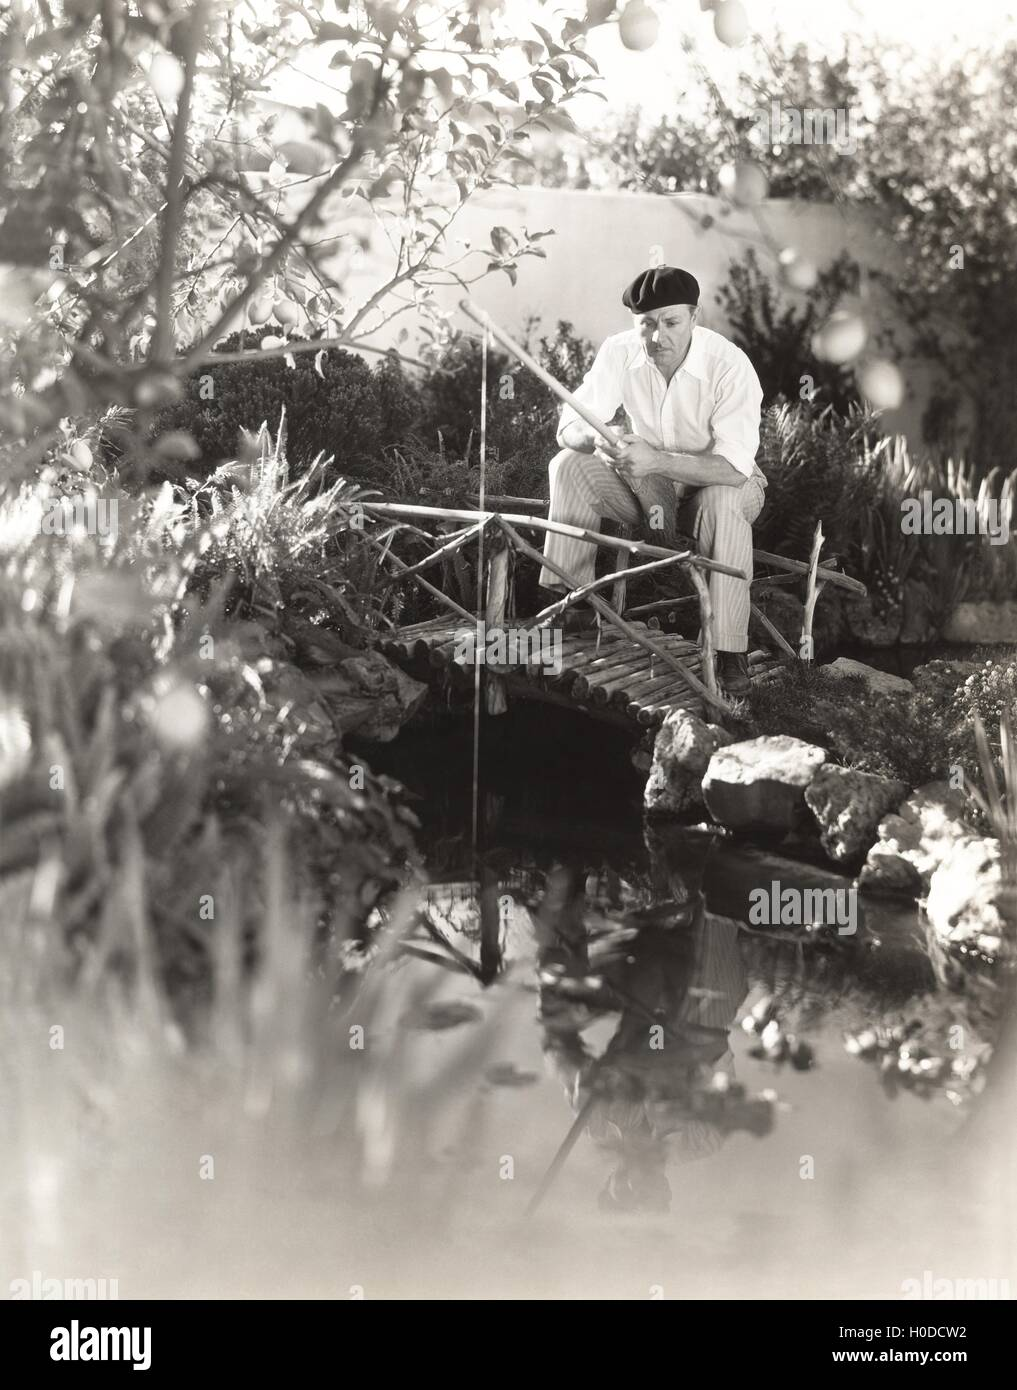 Man sitting on footbridge fishing in pond - Stock Image